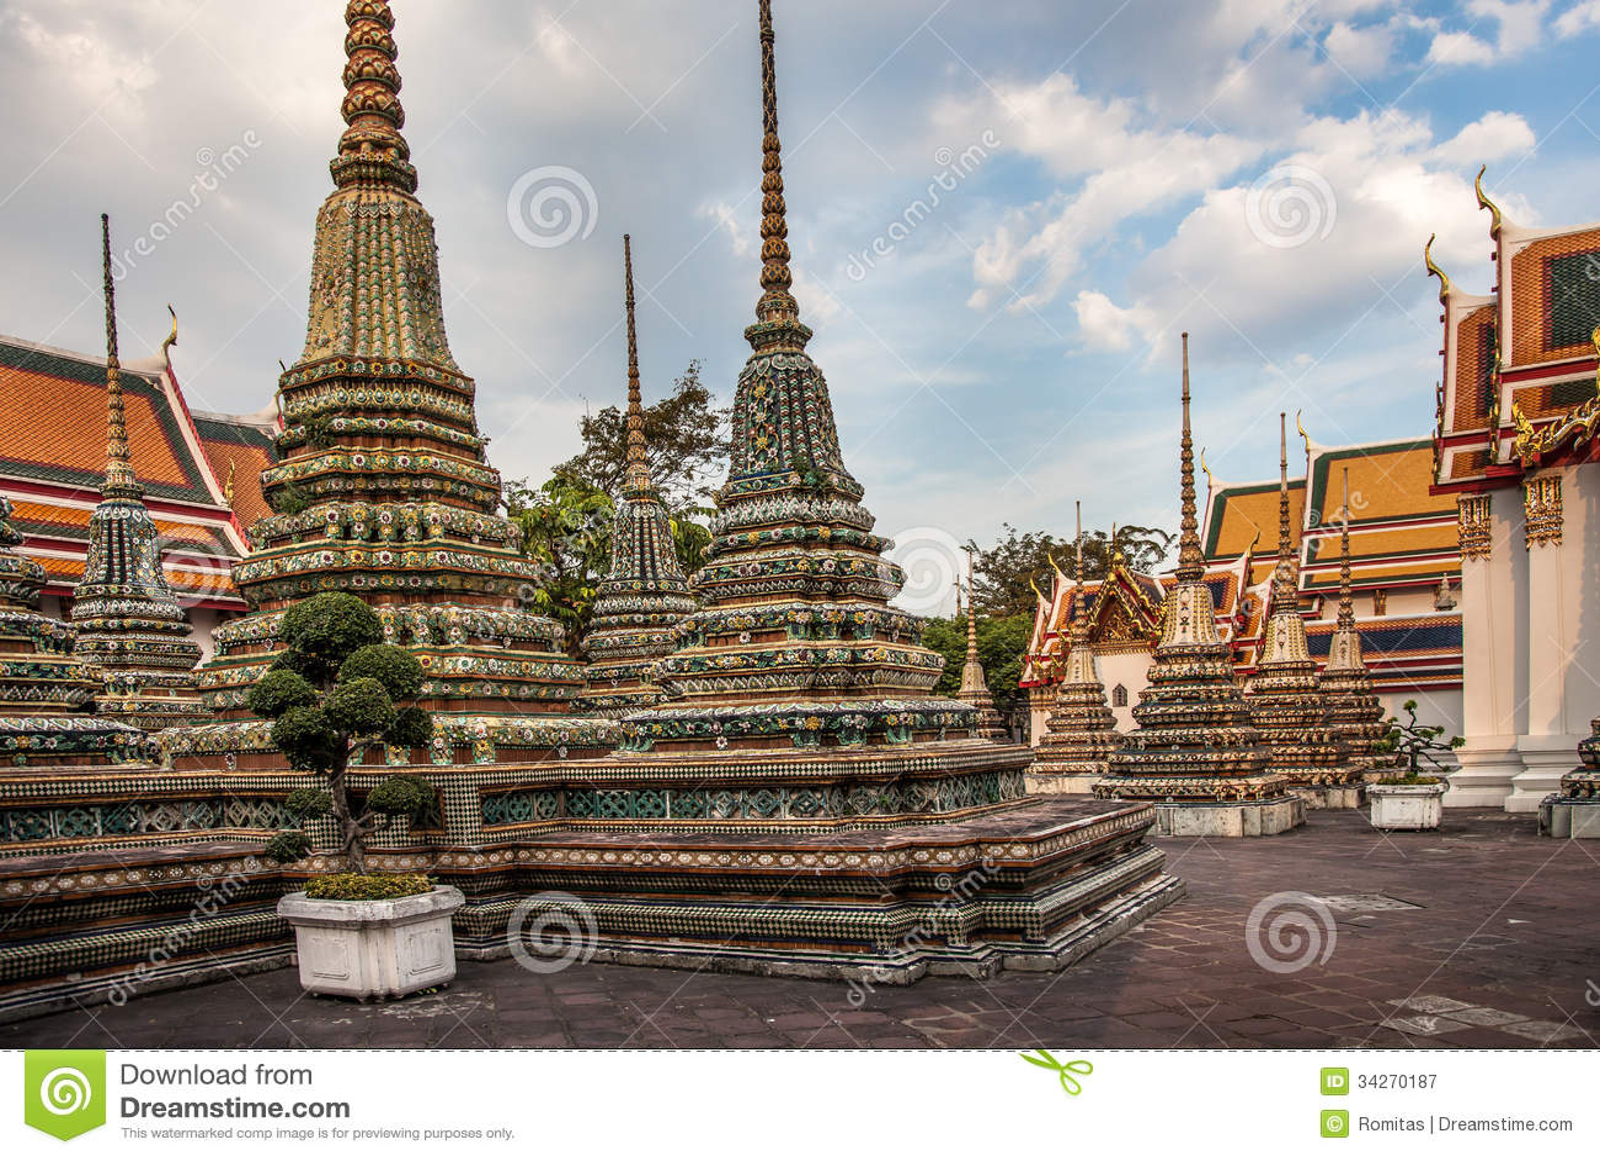 Phra Maha Stupa Of Wat Phra Chetuphon In Bangkok Royalty ...